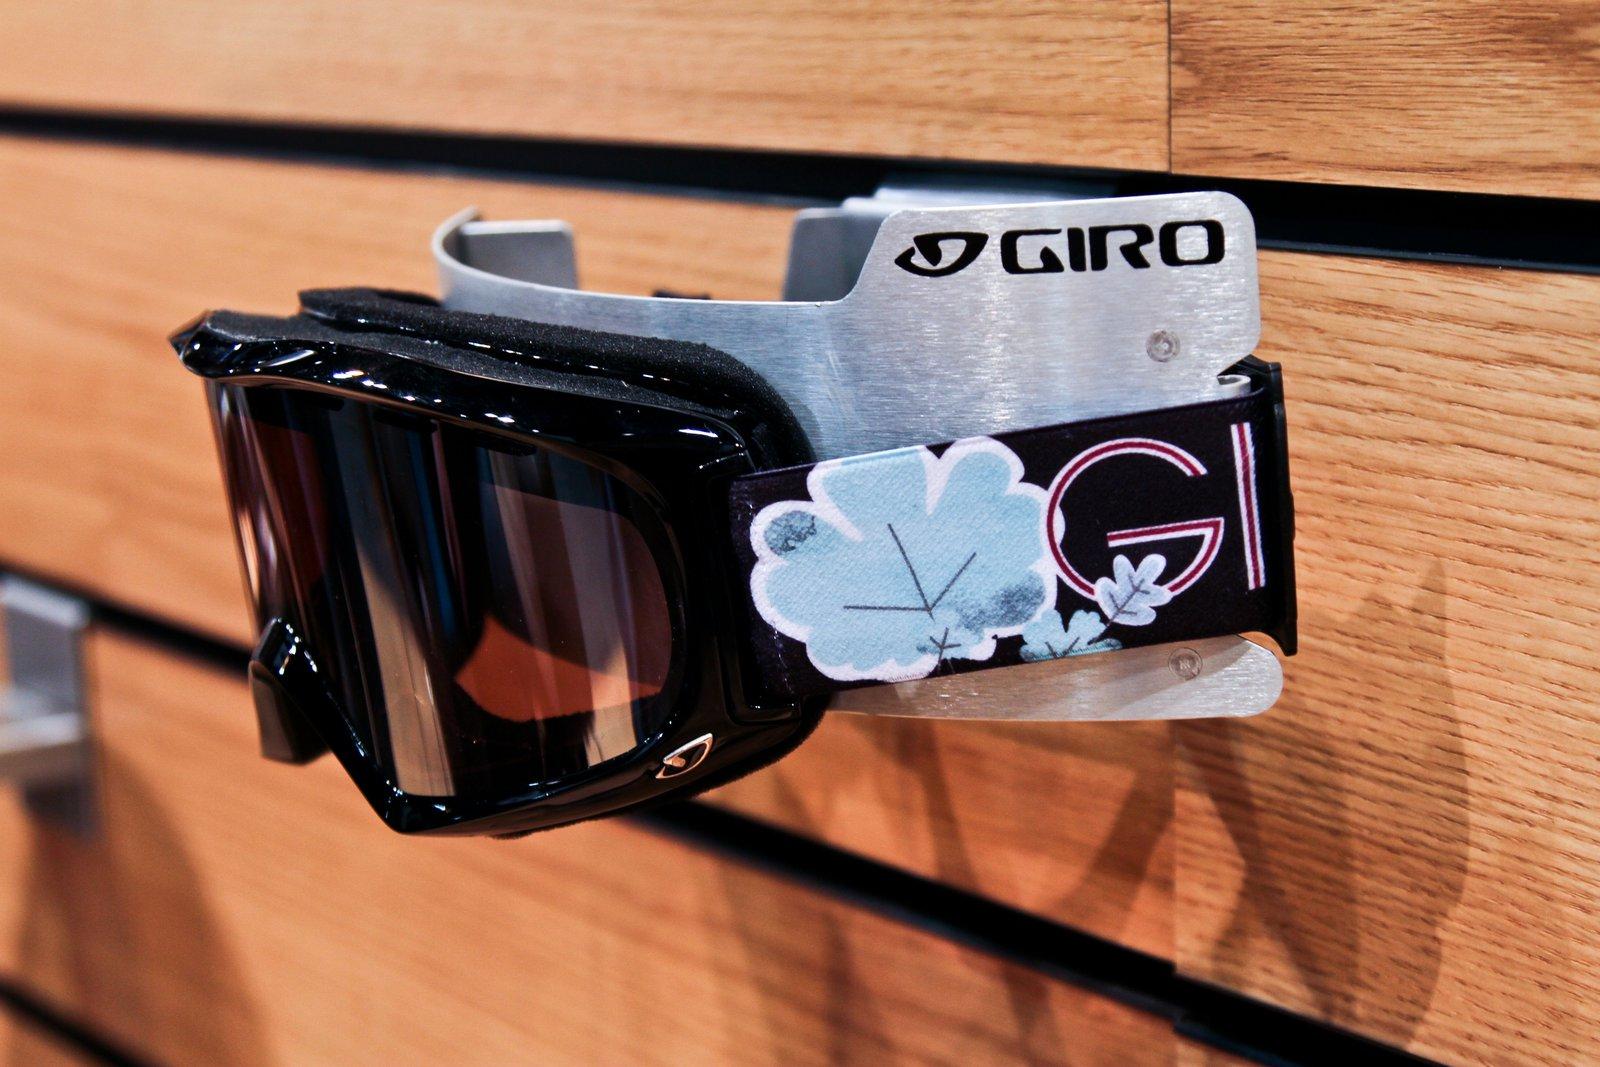 Giro-4.jpg